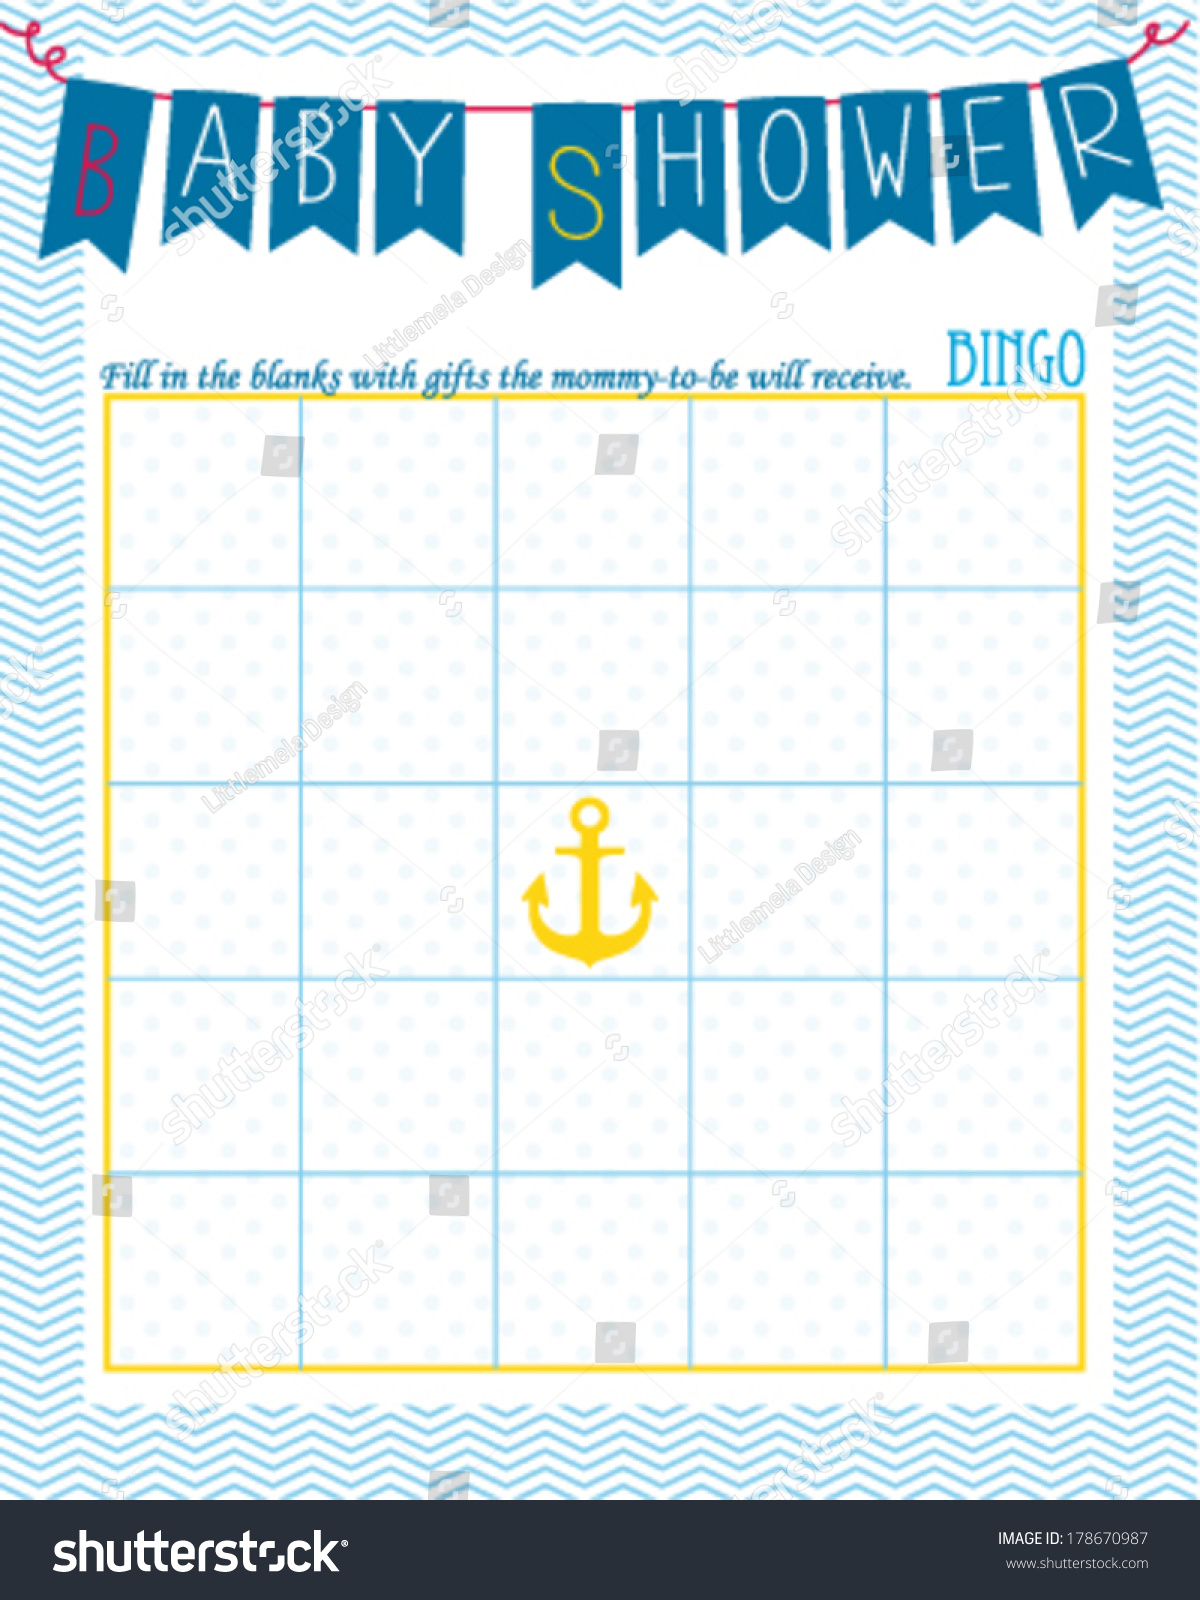 Baby Shower Bingo Game Template Sailor Stock Vector